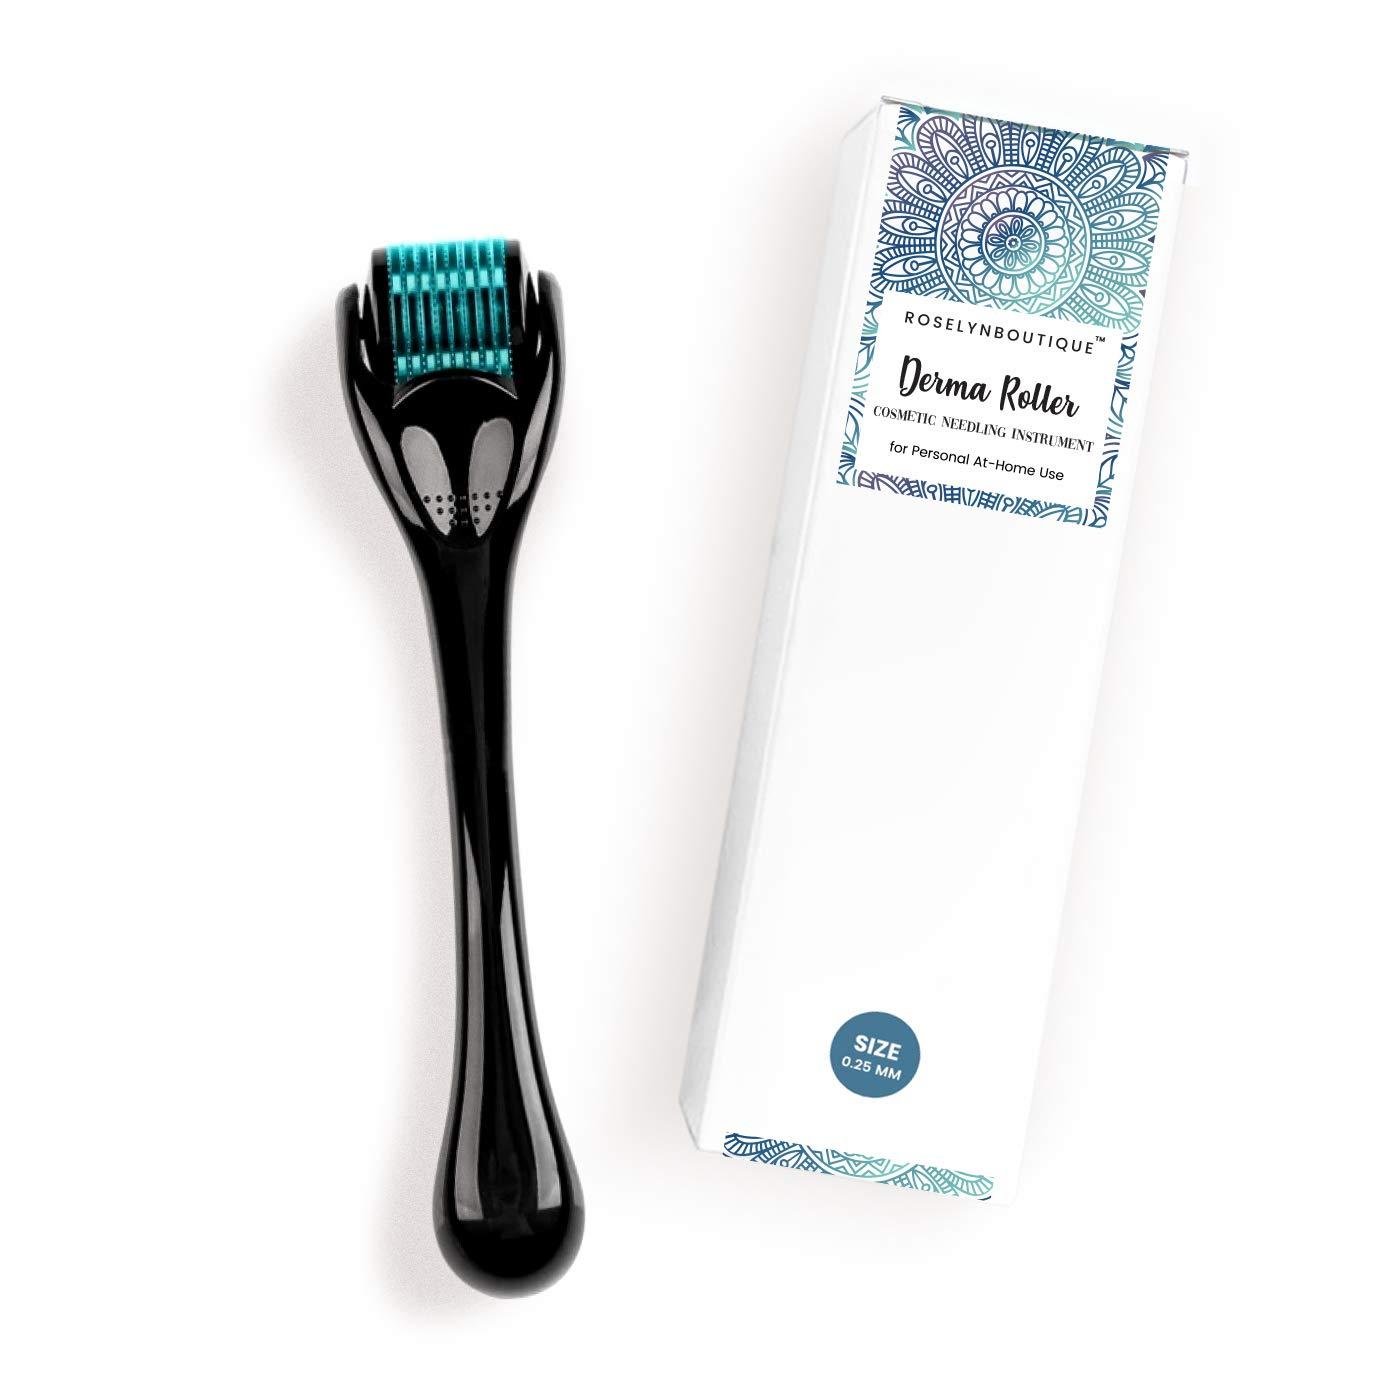 Amazon Com Roselynboutique Derma Roller 540 Titanium Microneedle 0 25mm Cosmetic Beauty Instrument Kit Storage Case 1 Pack Beauty